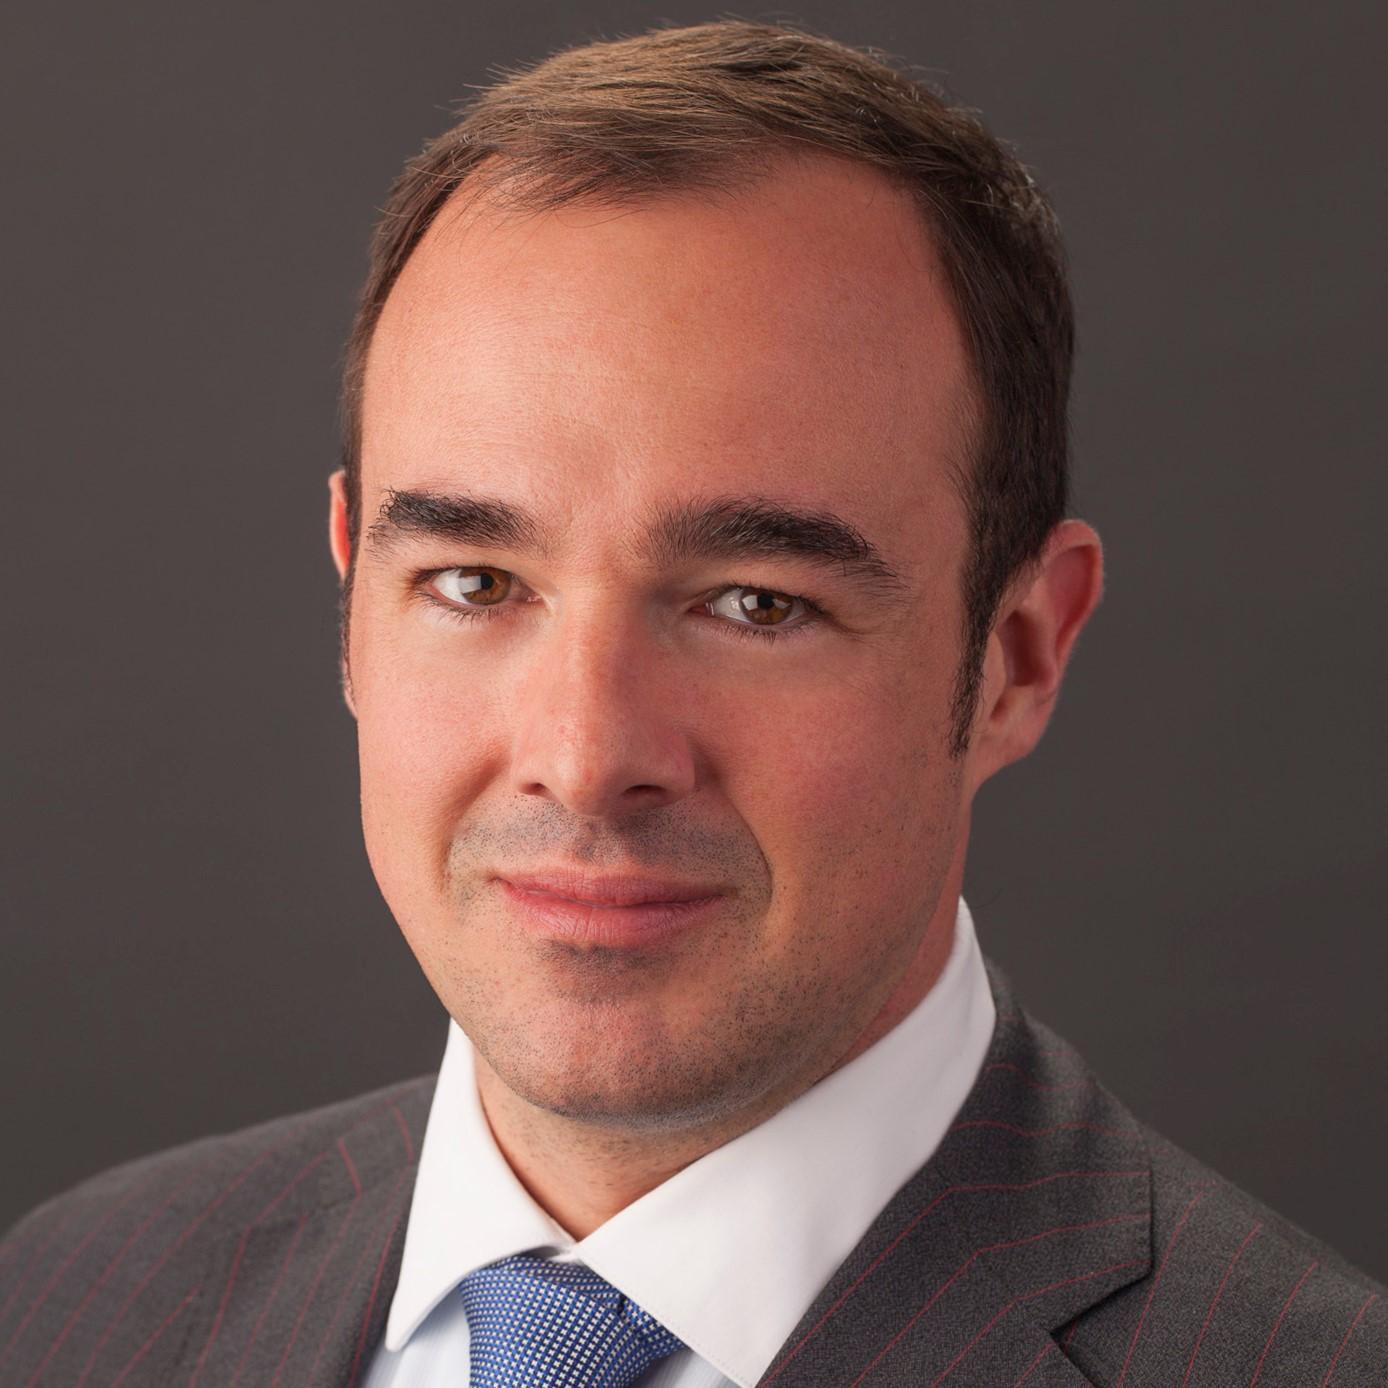 Tarek Souki